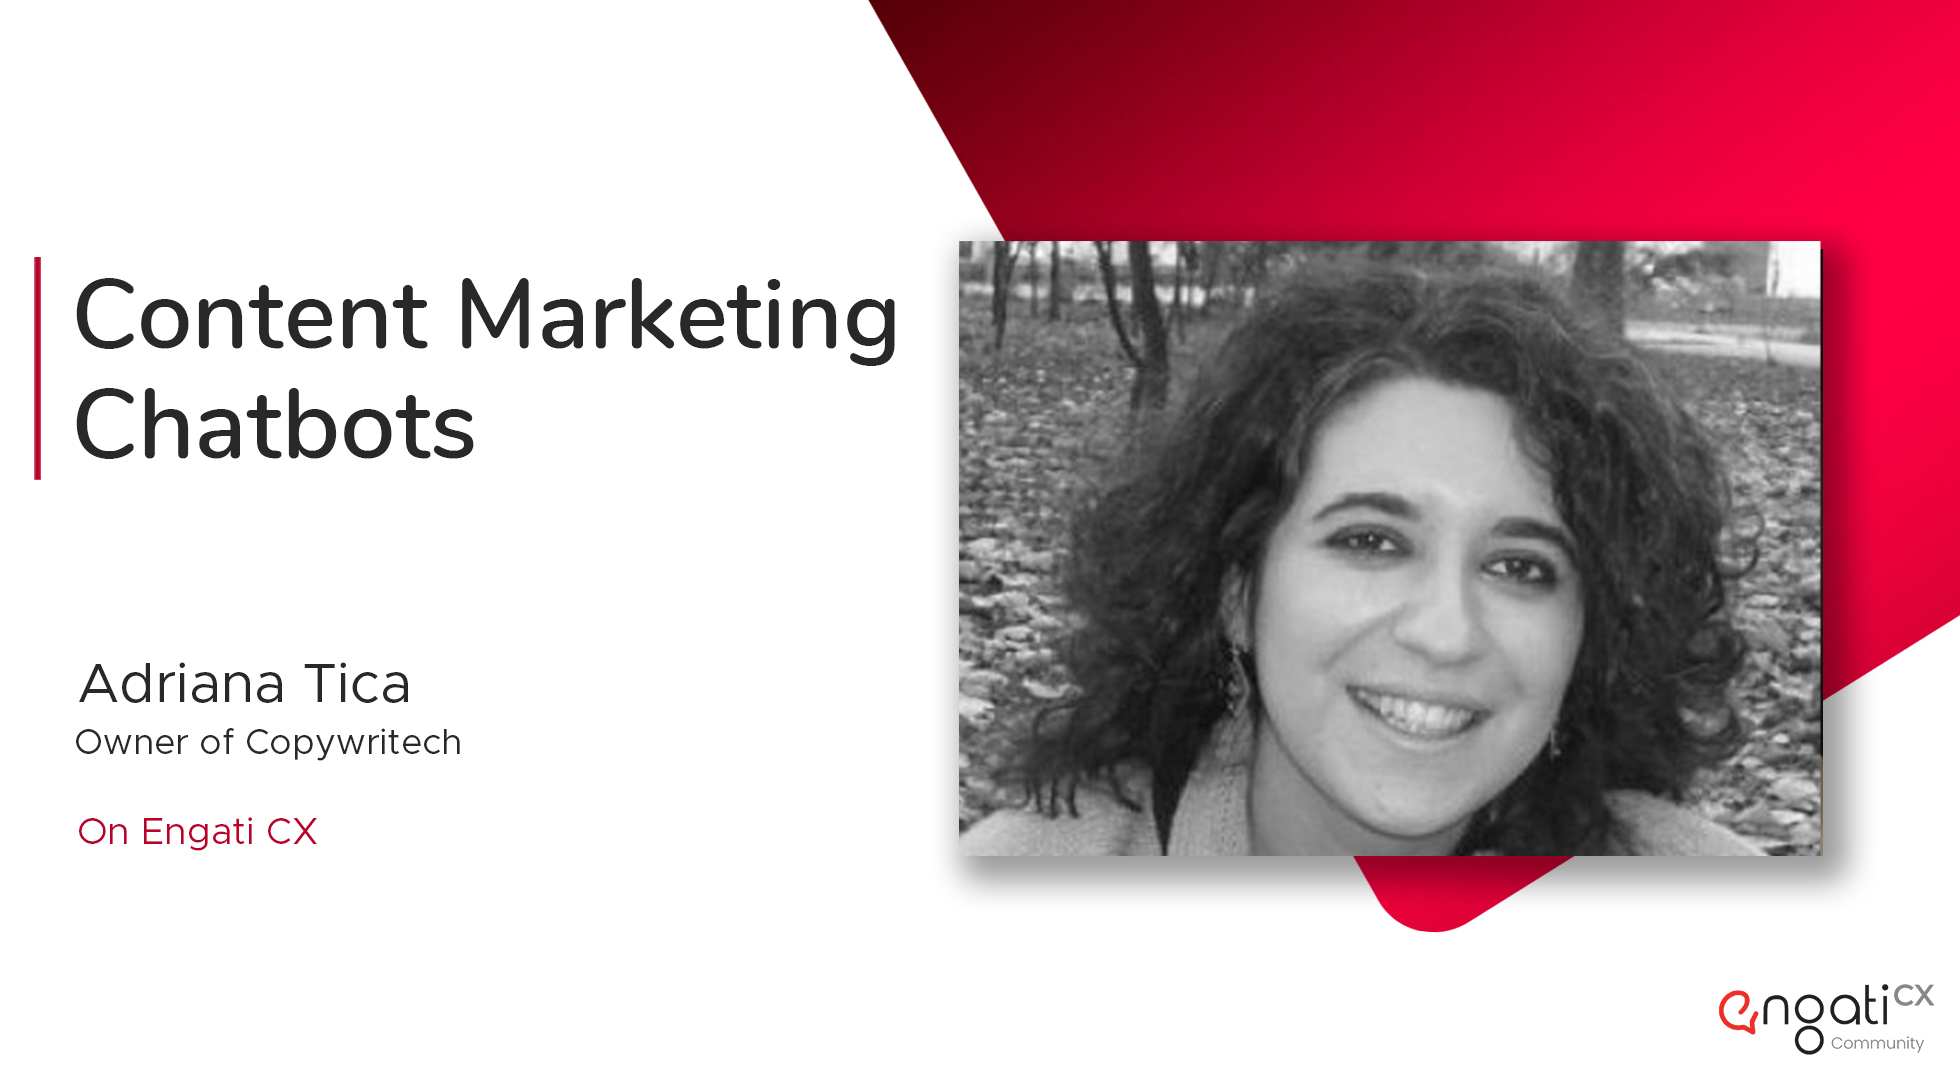 Content marketing chatbots | Adriana Tica | Engati CX